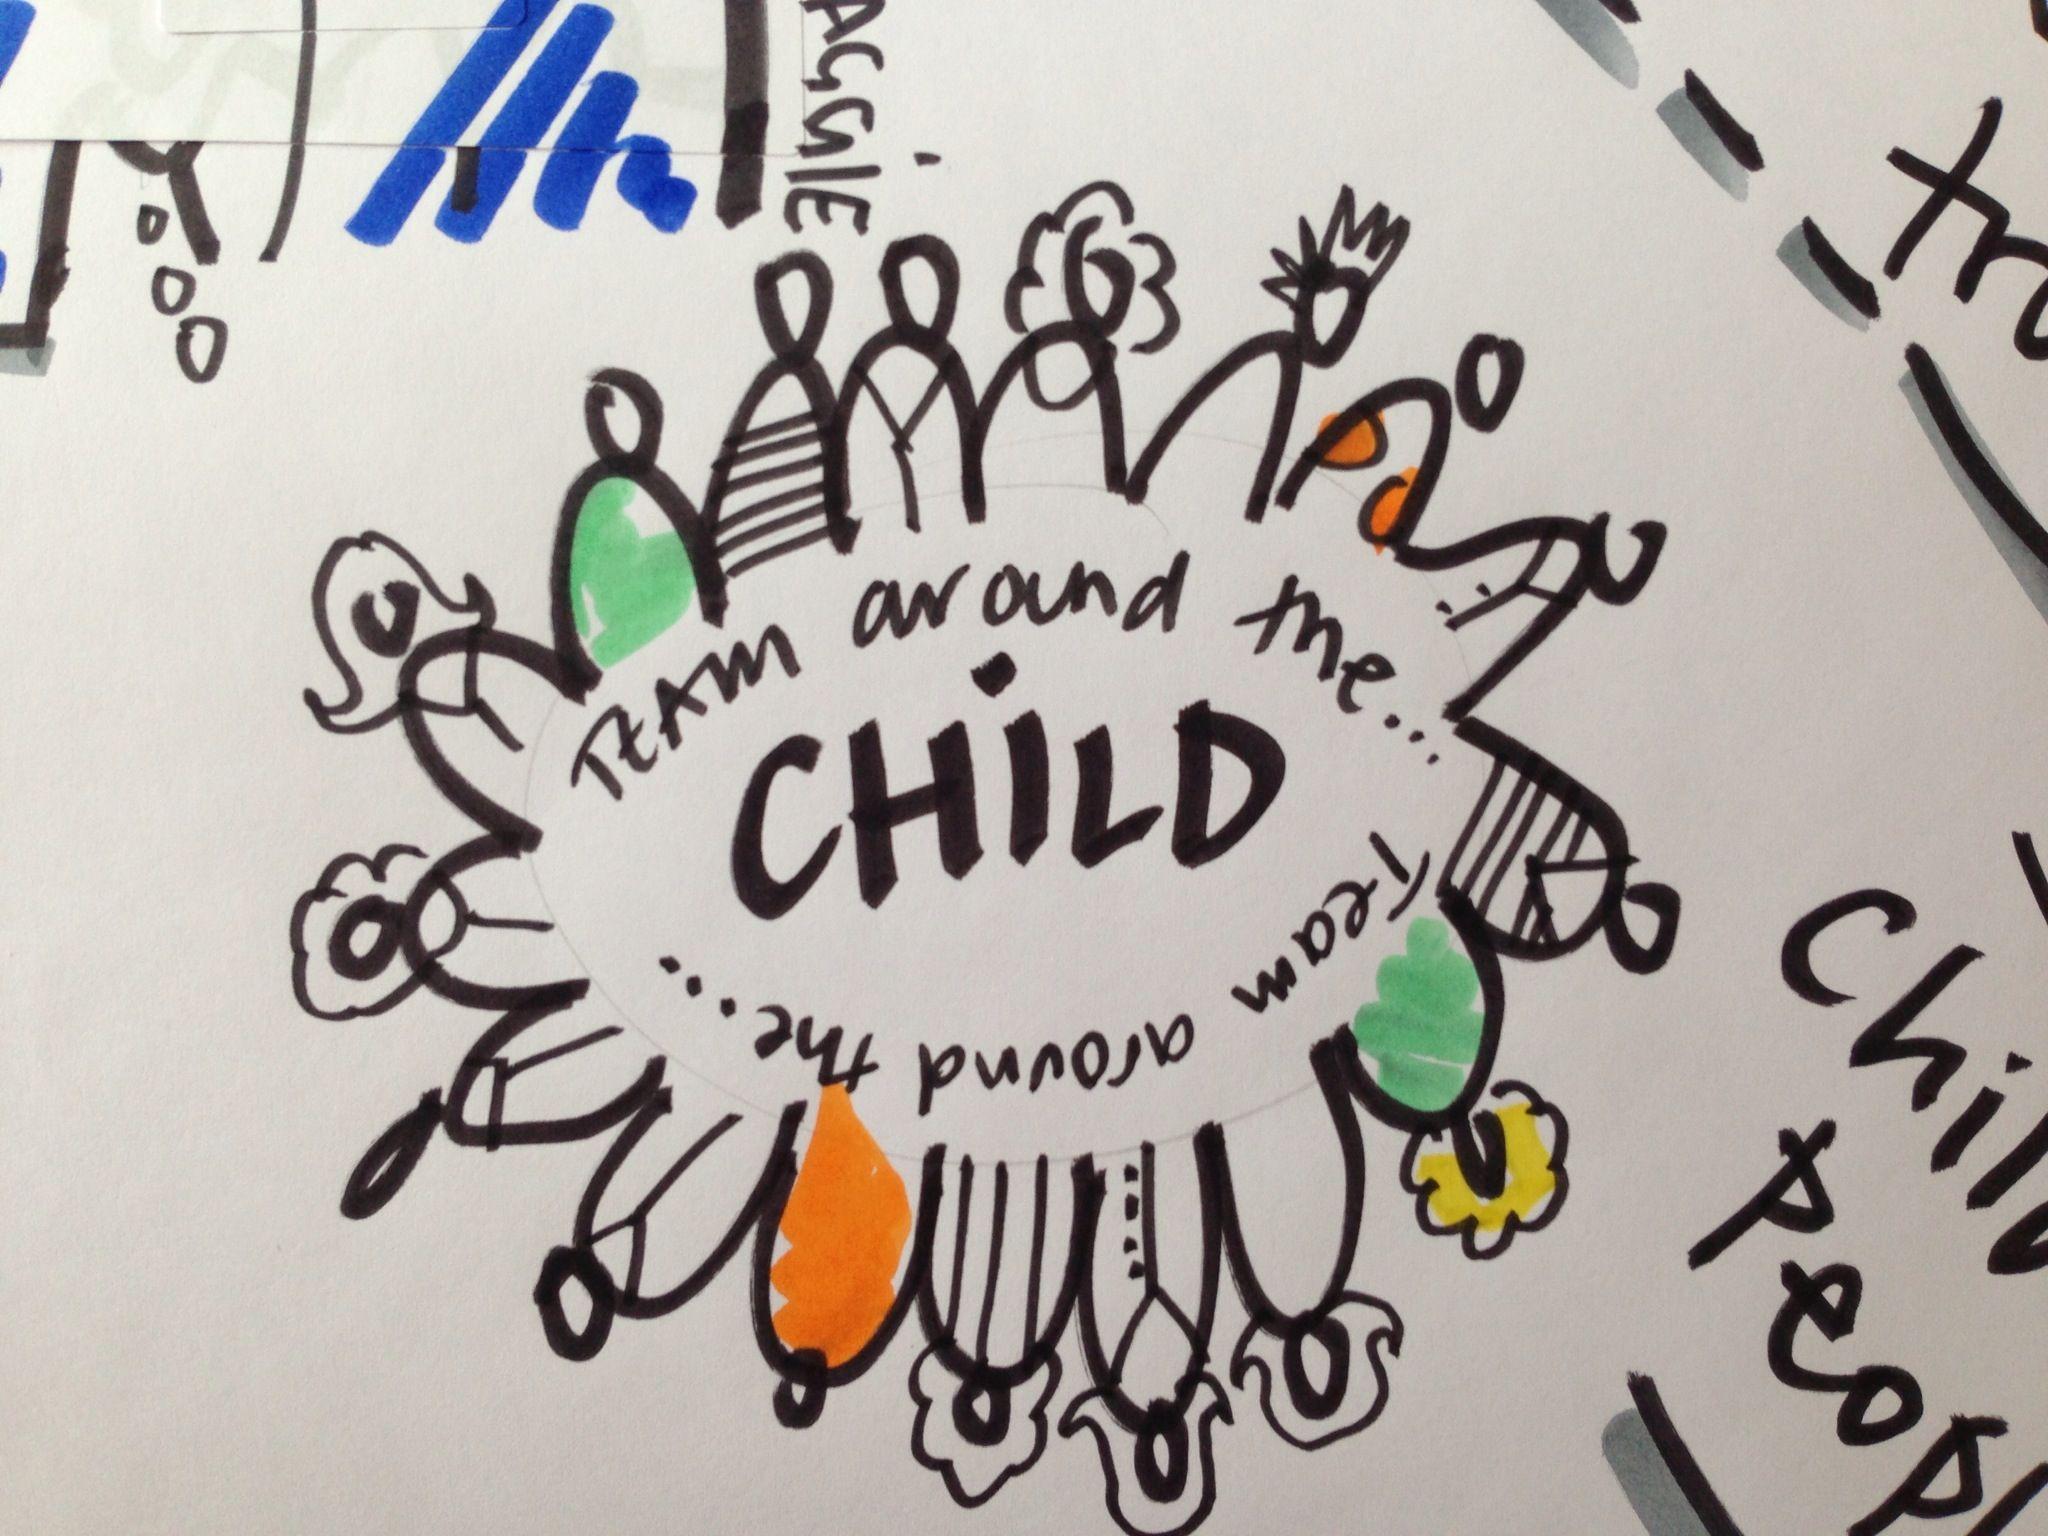 Diversity Graphic Team around the child | Graphic Facilitation ...